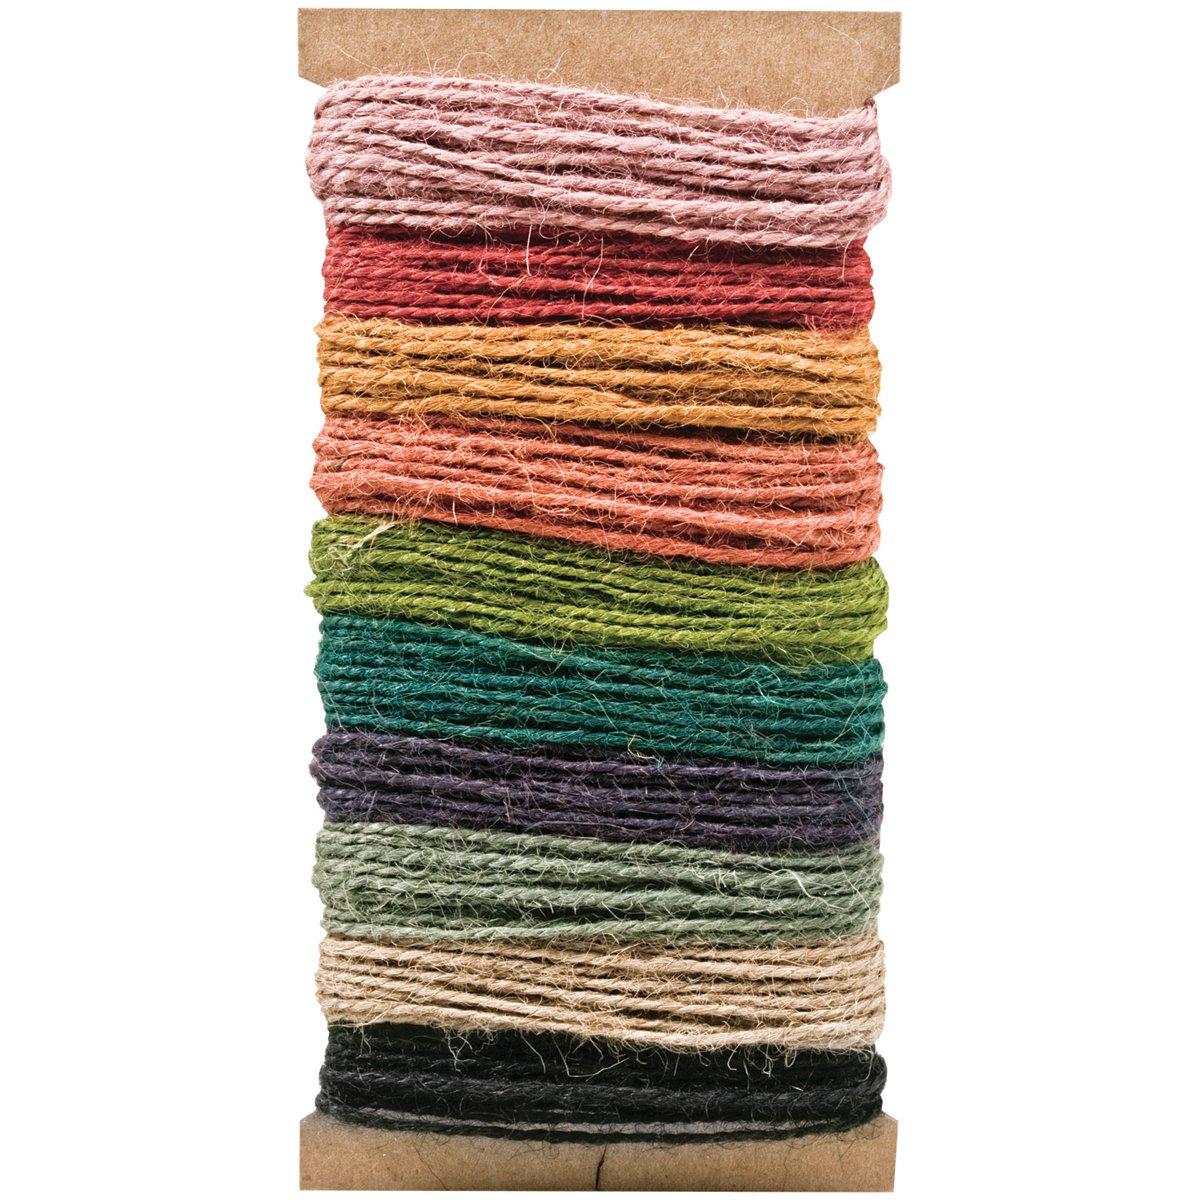 Tim Holtz Idea-ology Jute String, 10-Color, 3-Yard Each, 30-Yard Total, TH93139 Advantus Corp.